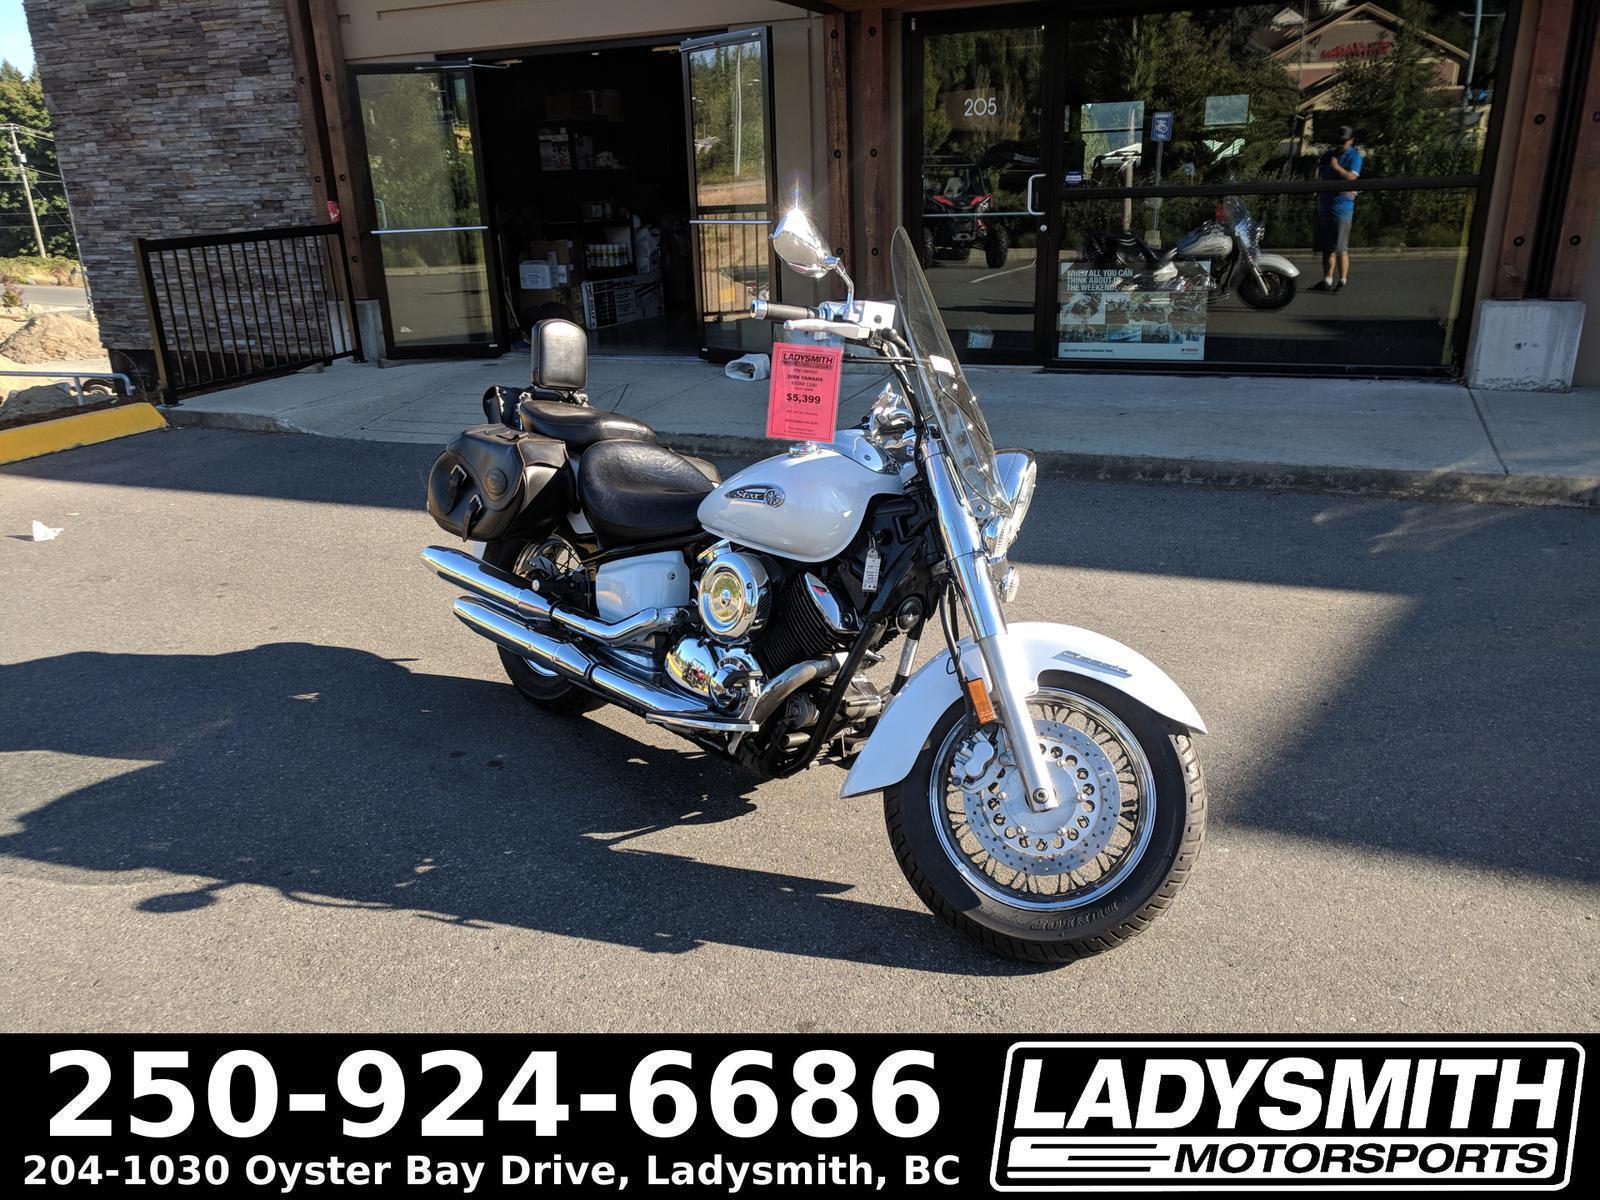 2008 Yamaha V Star 1100 Silverado for sale in Ladysmith, BC